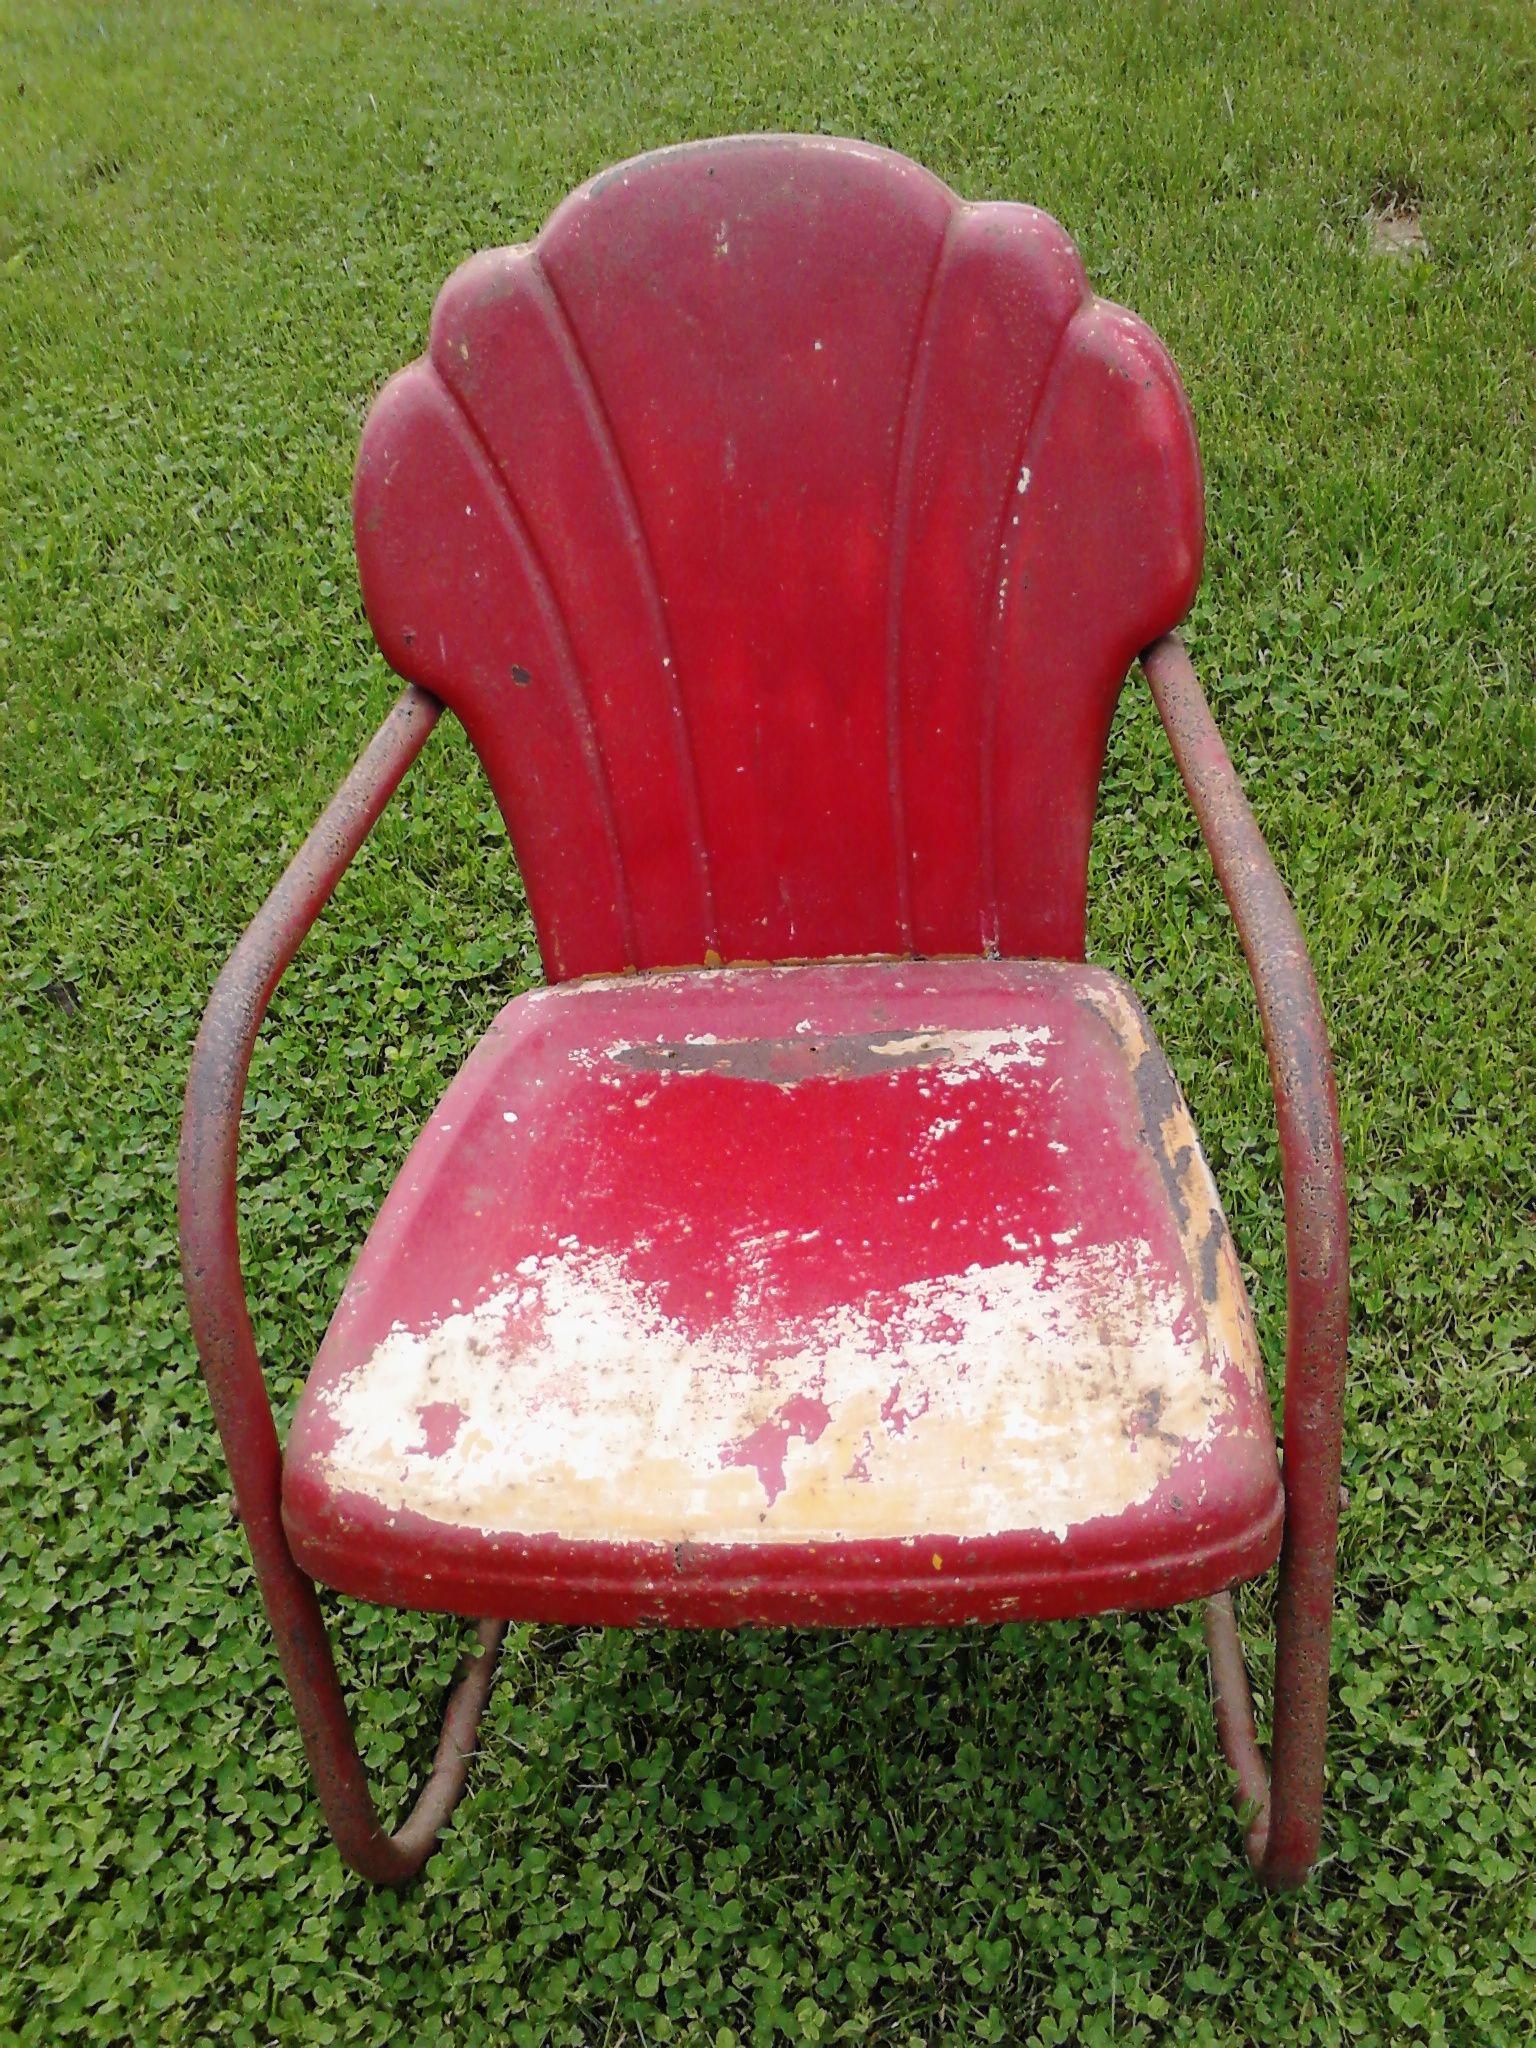 Calumet vintage metal lawn chairs www.midcenturymetalchairs.com